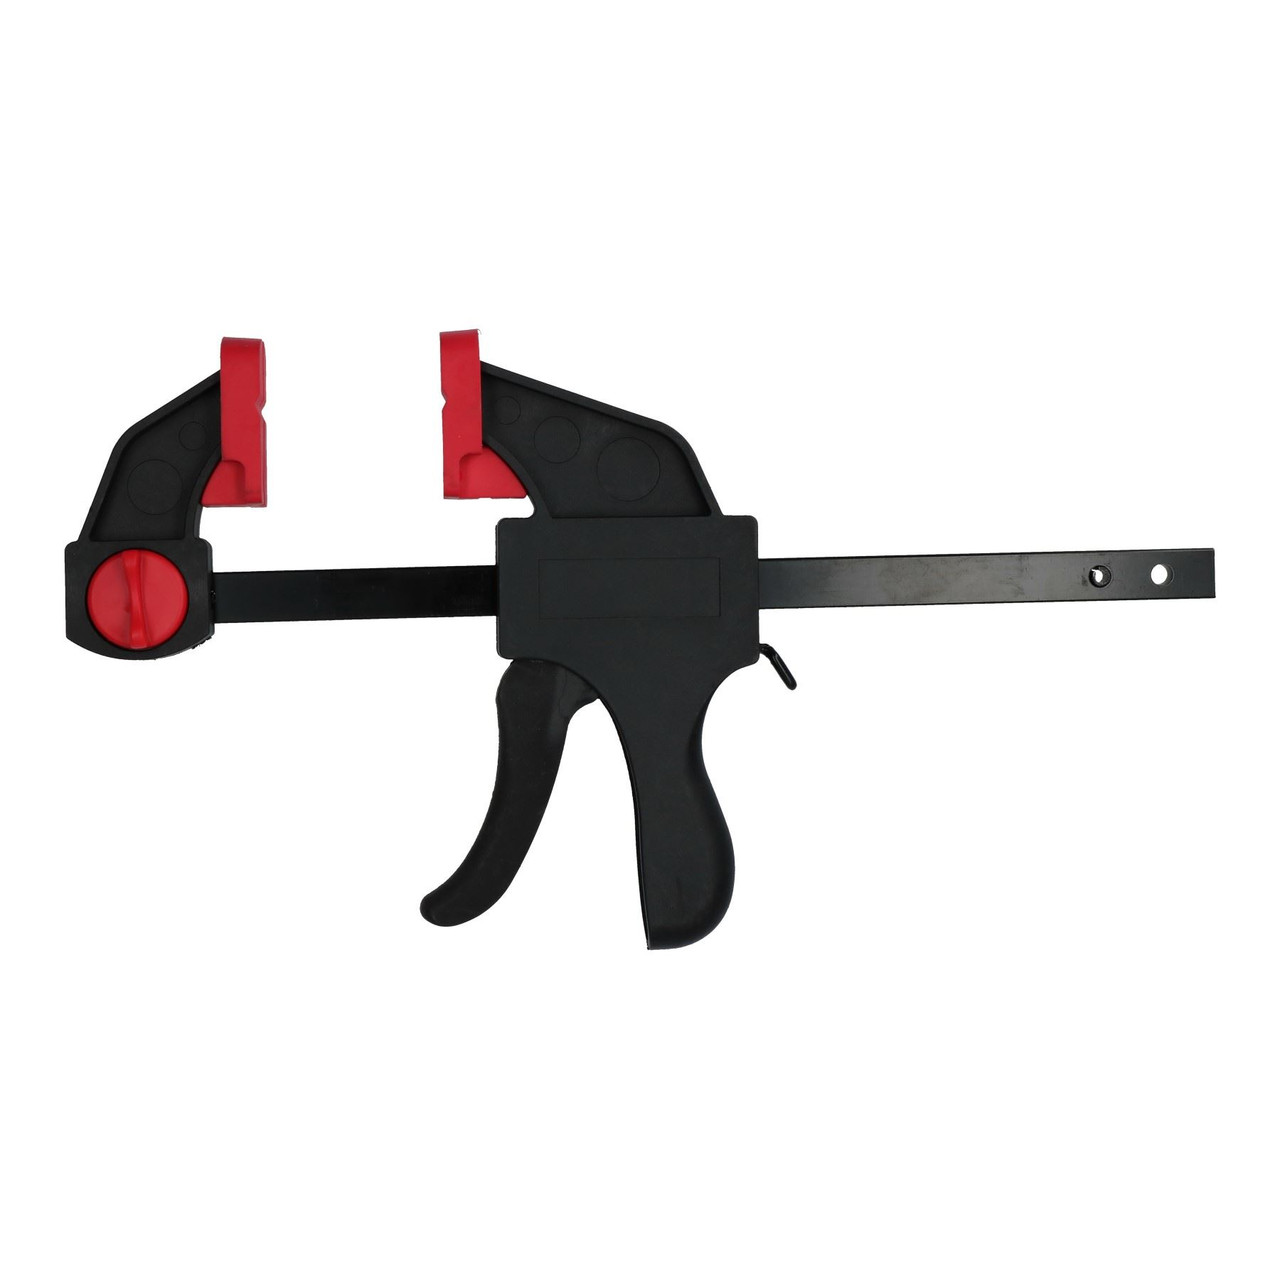 18 Rapid Quick Ratchet Bar Clamp Spreader Grip Holder TE604